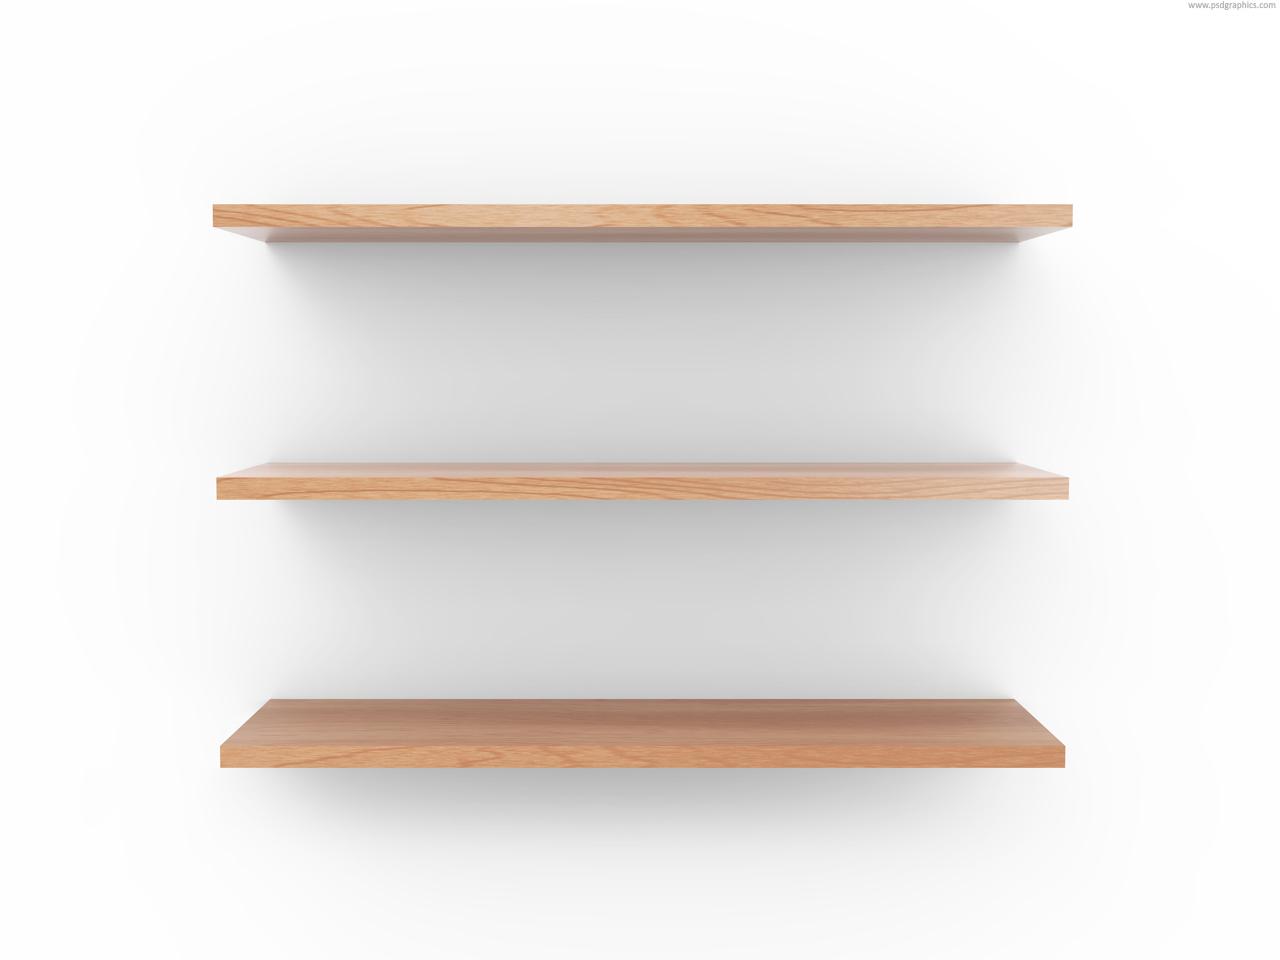 Medium size preview (1280x960px): Wooden shelf